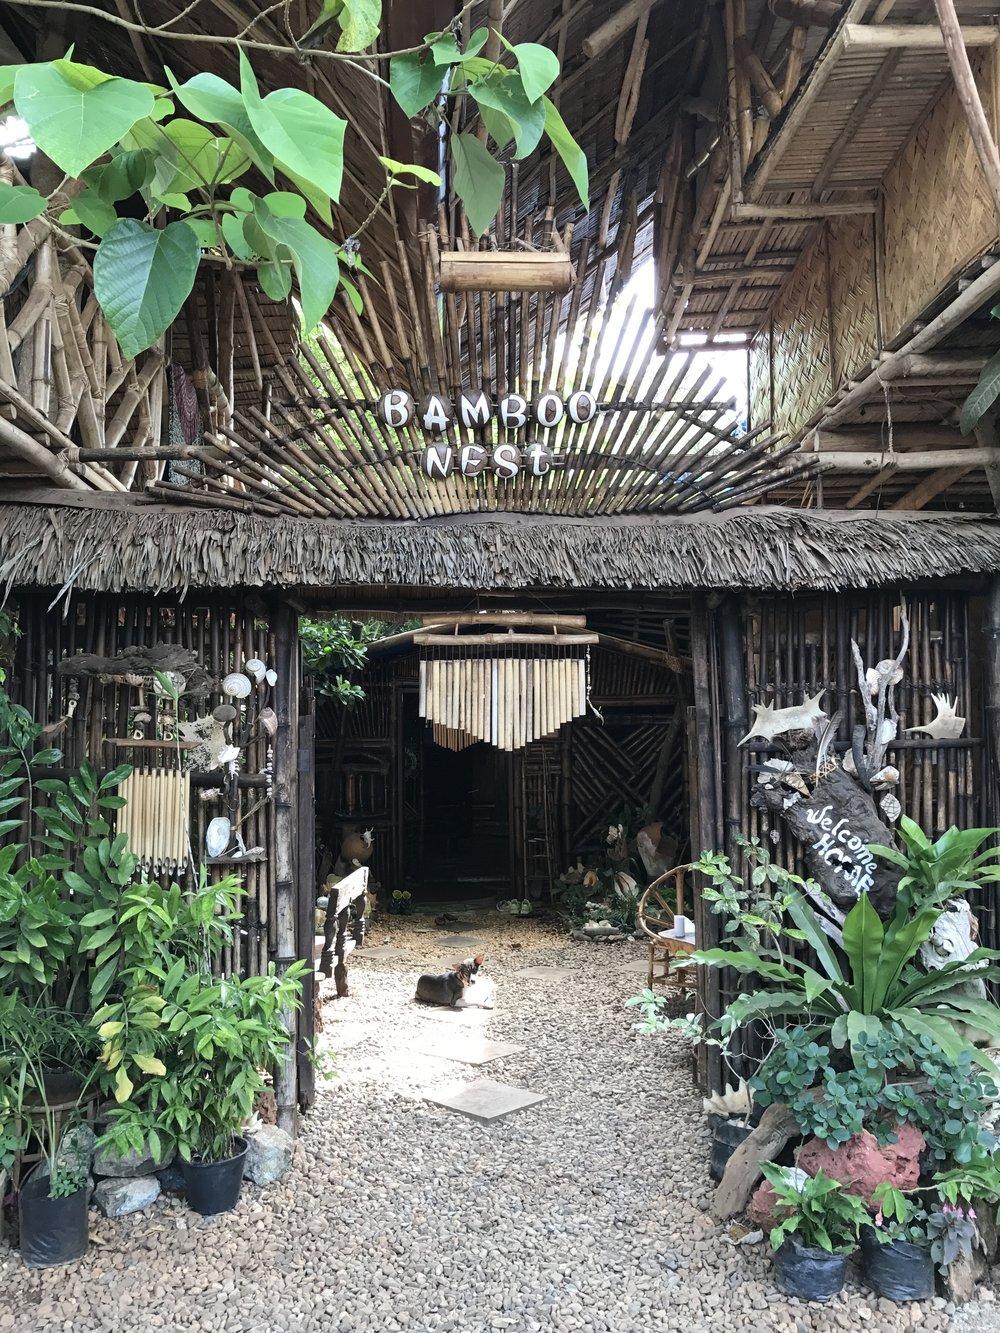 Bamboo Nest Puerto Princesa Palawan Philippines